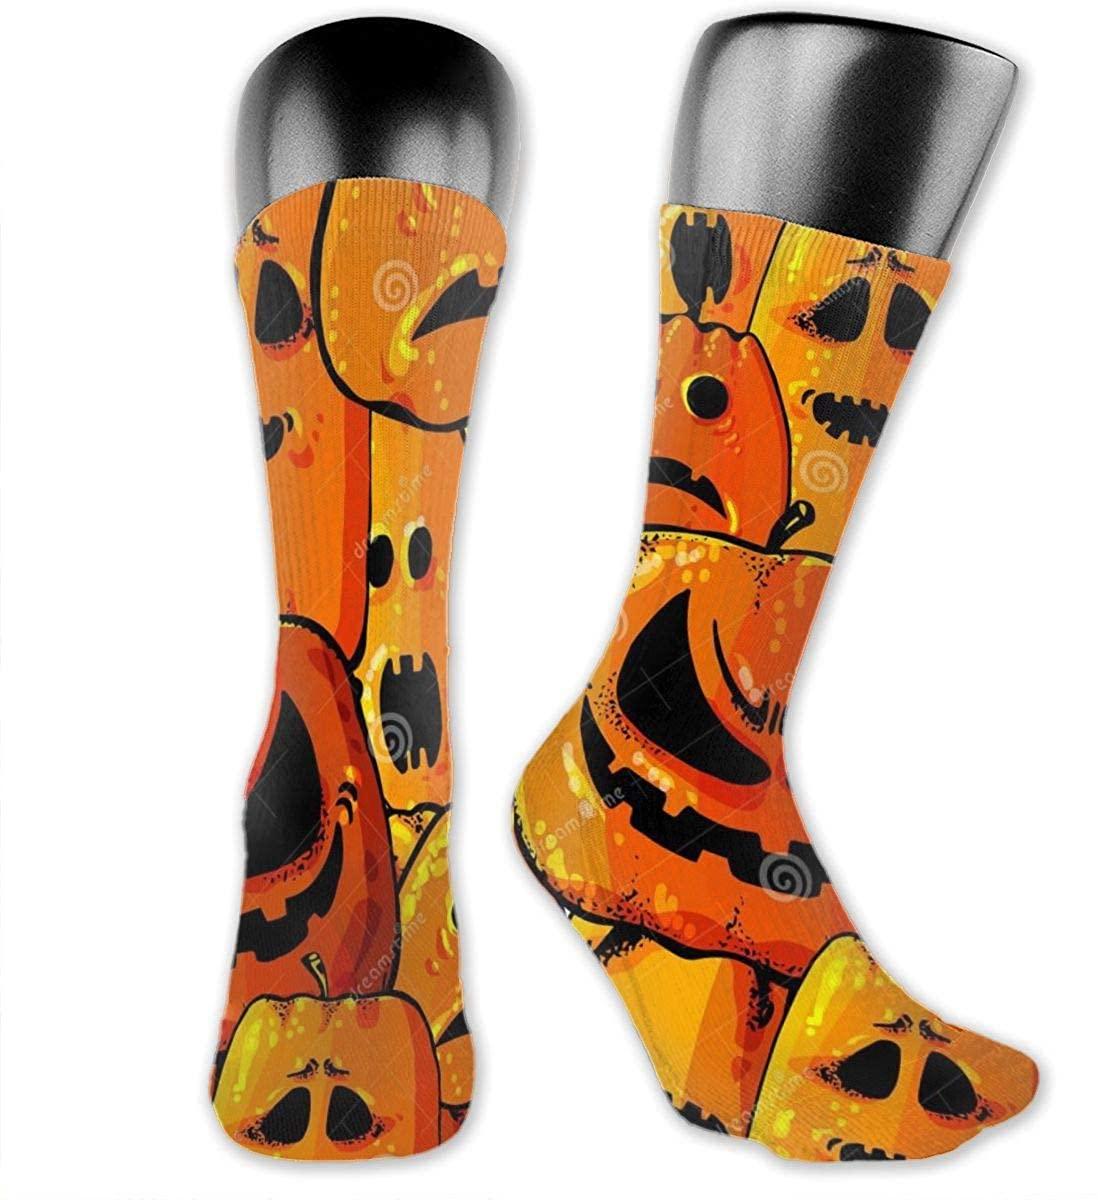 Fdeskaw 3D Halloween Pumpkin Head Background Crazy Design Soft & Stretchy Novelty Crew Socks For Men, Women & Kids